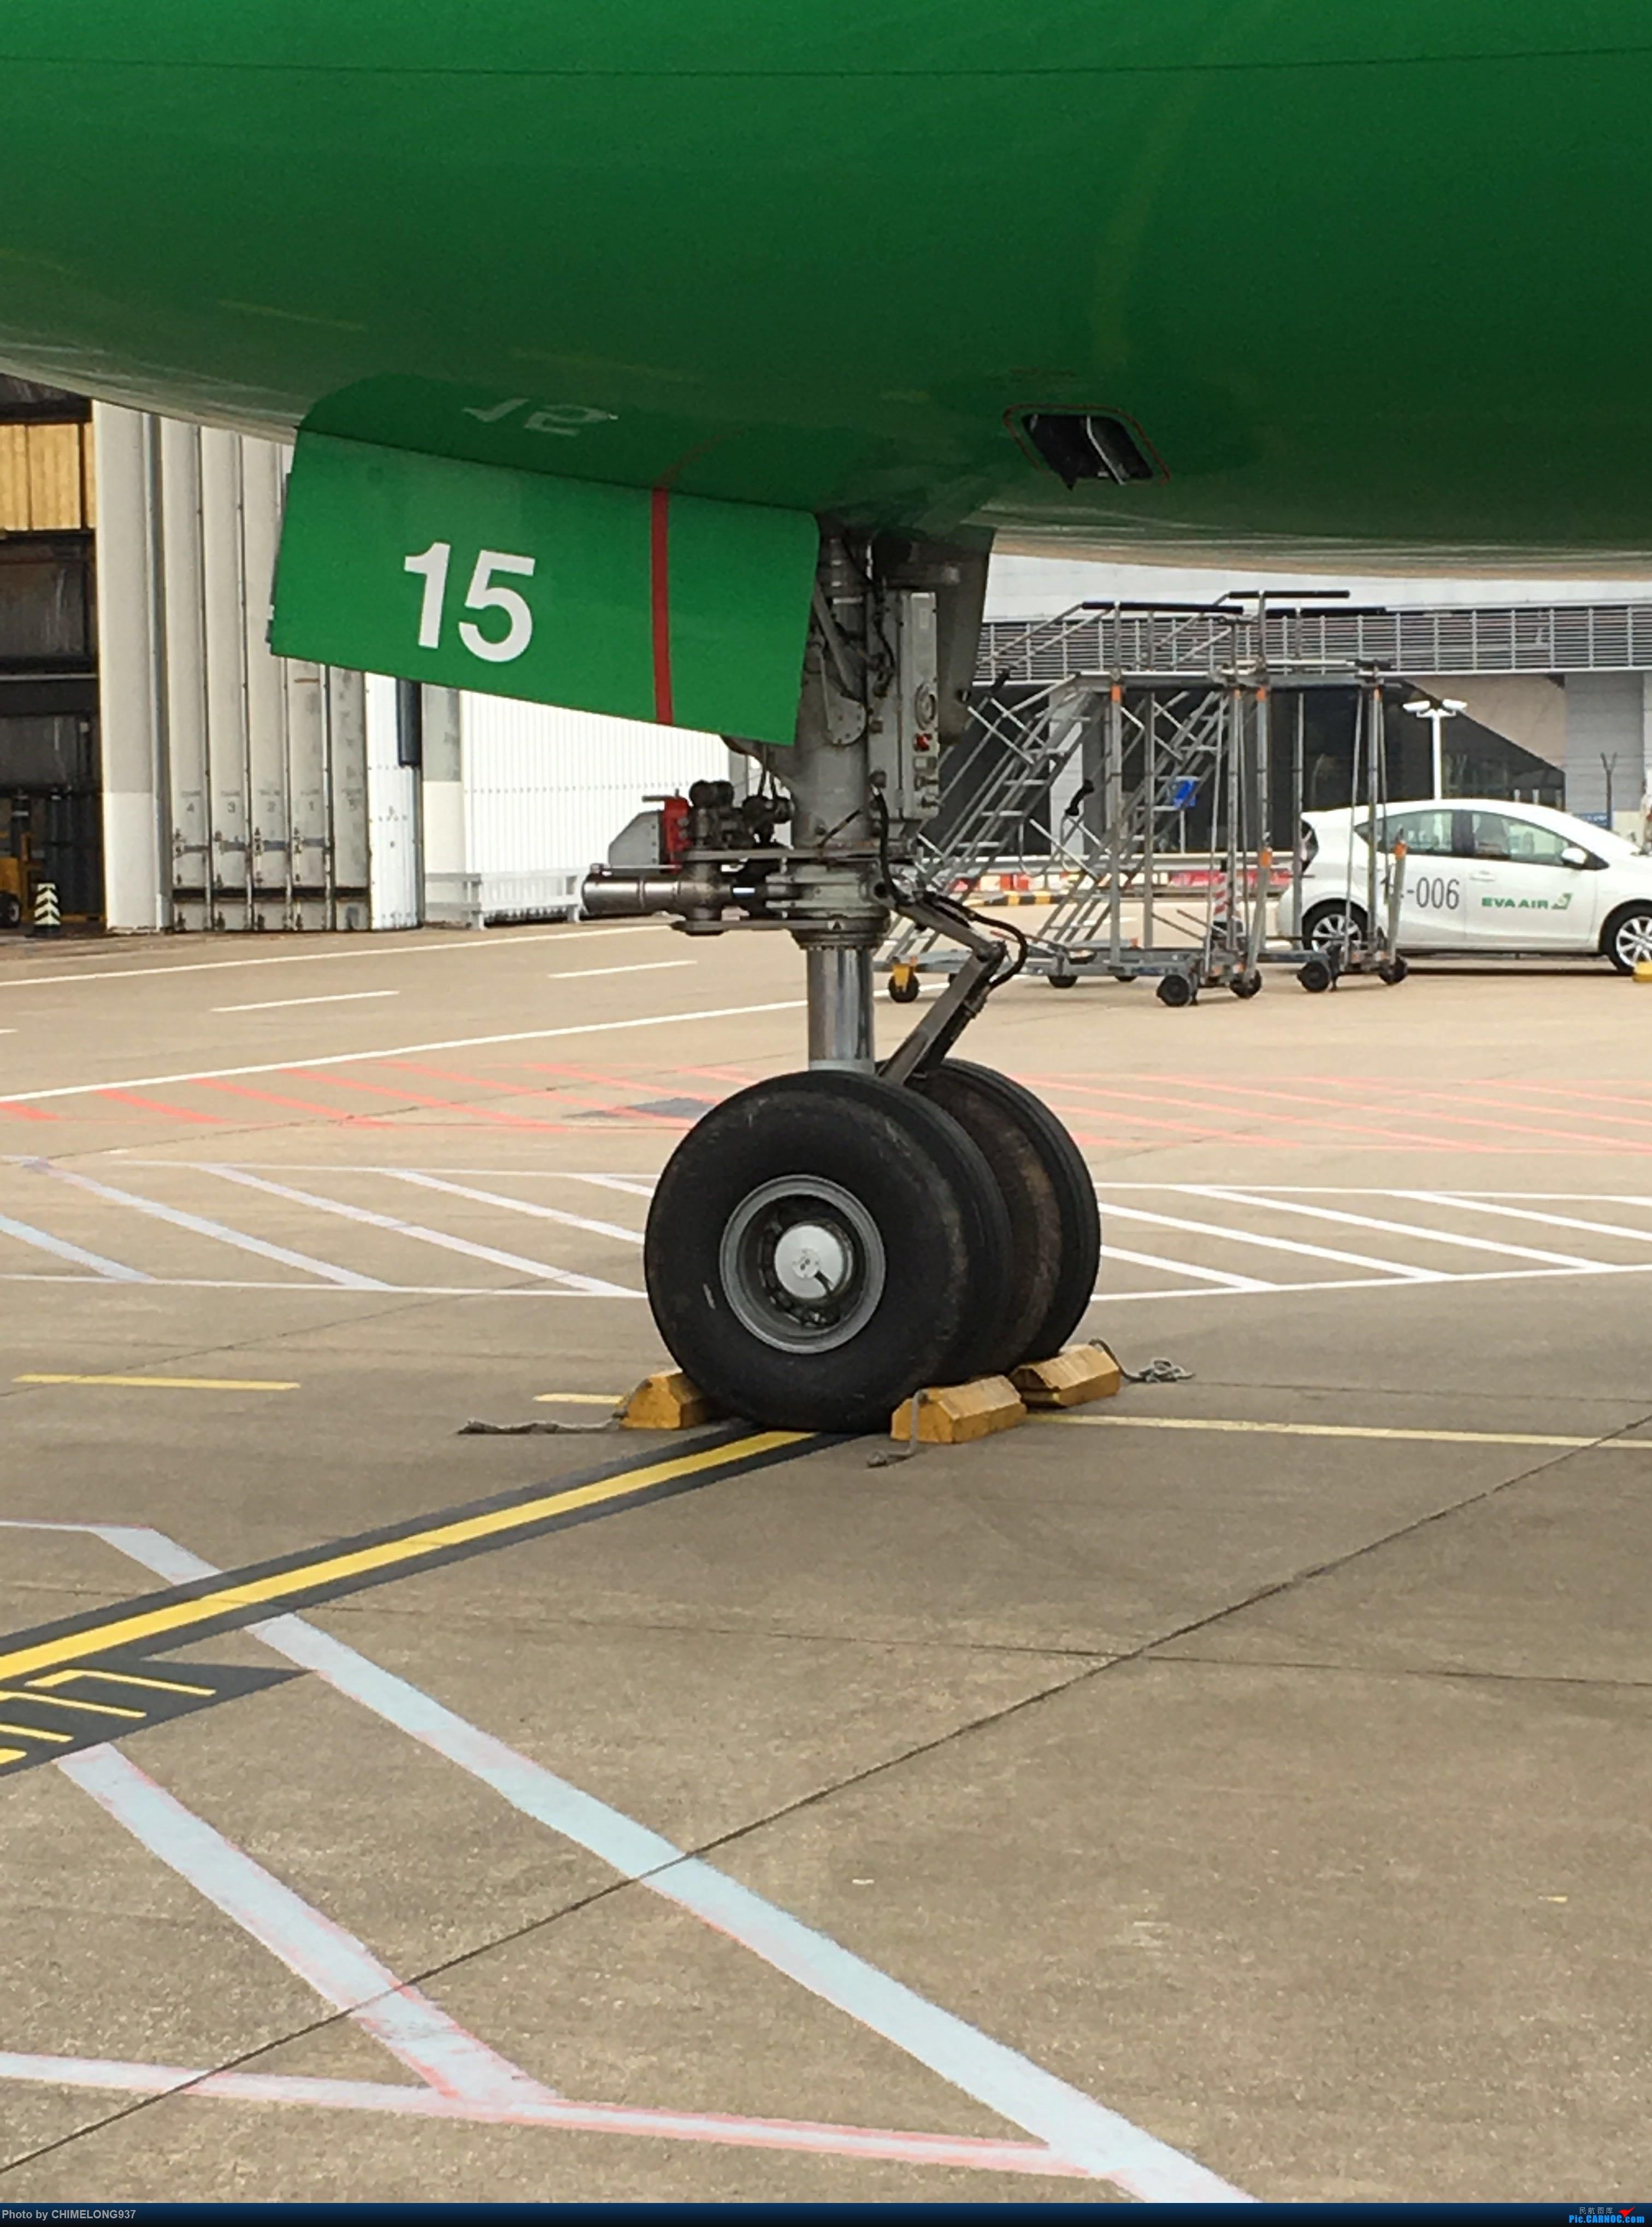 Re:[原创]【Feeyo Macau】长荣大头及起落架 BOEING 777-300ER B-16715 中国澳门国际机场